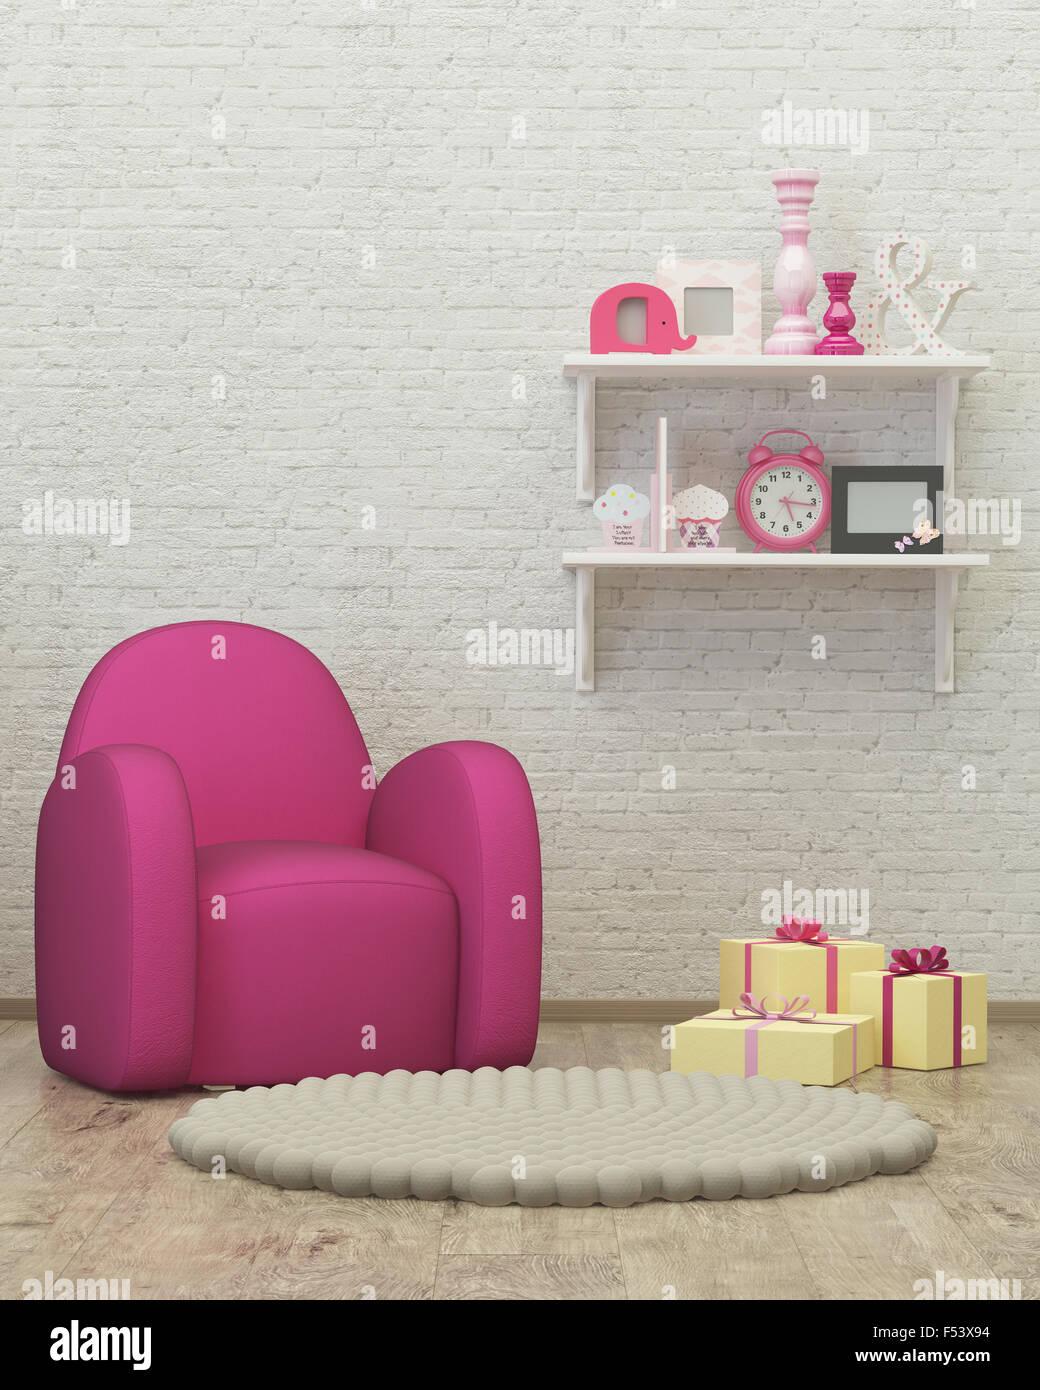 kids room interior 3d render image, pouf,presents stock photo